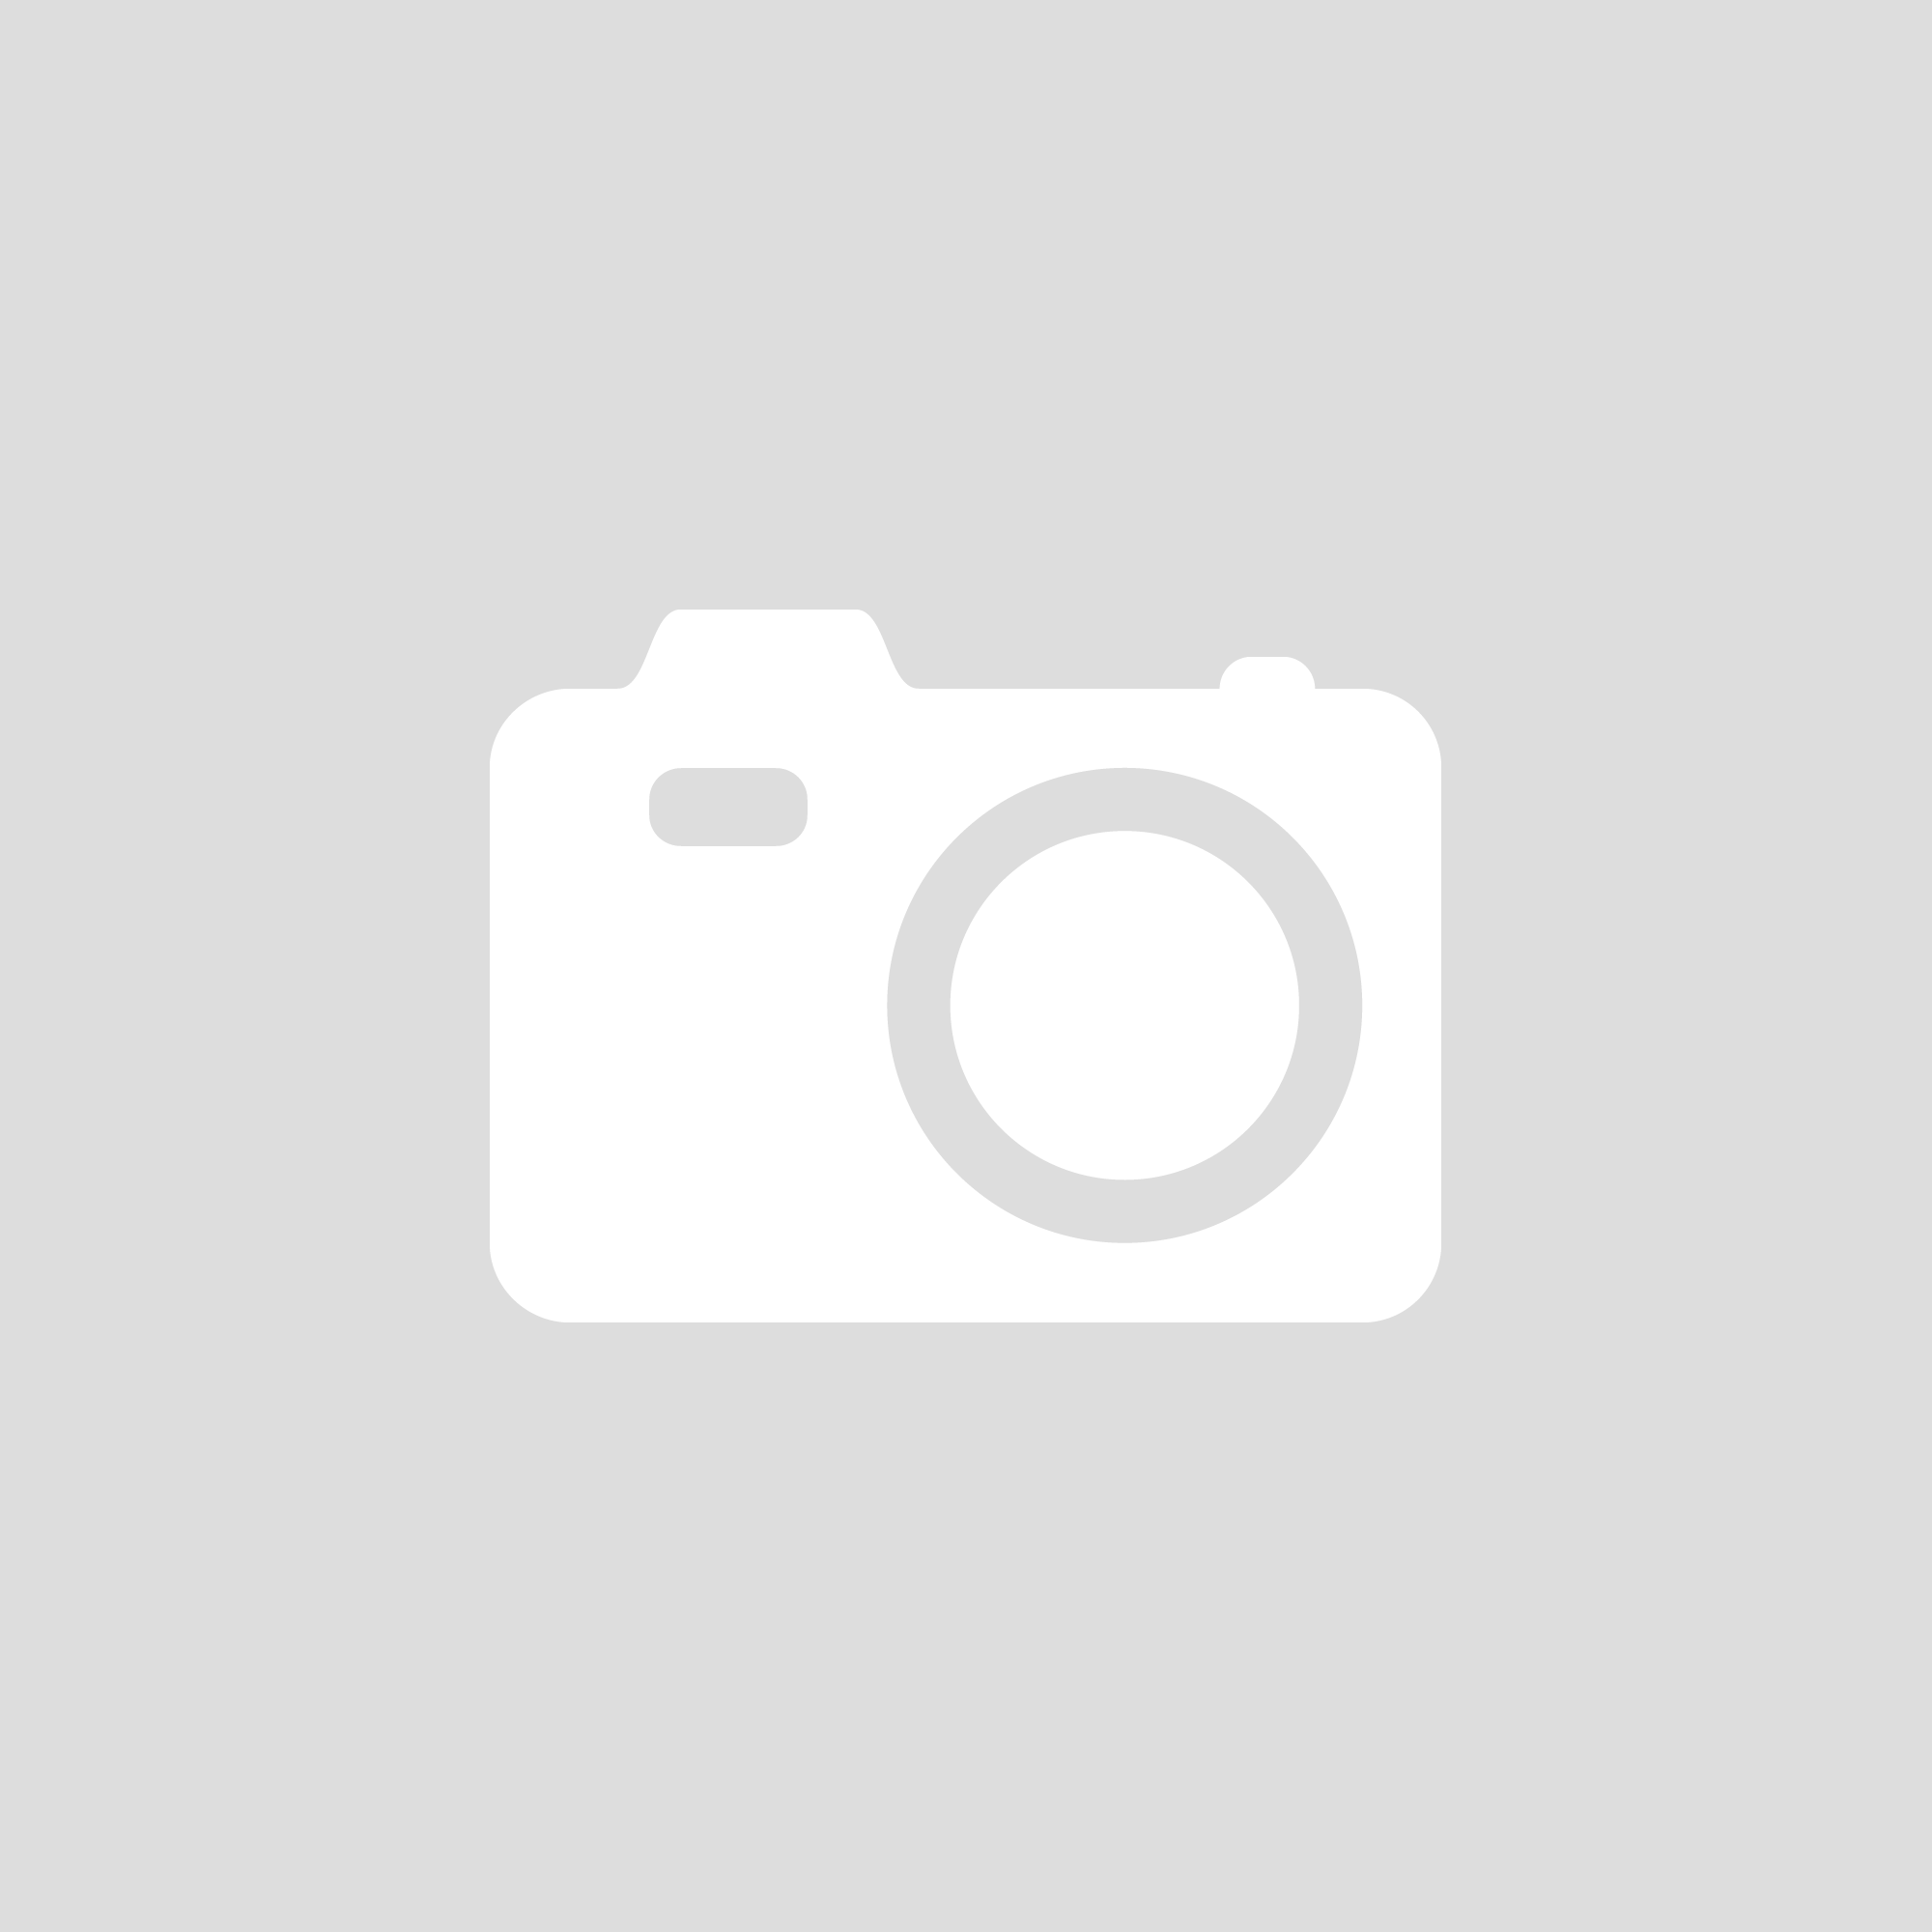 Sensation Plain Rich Orange Wallpaper by GranDeco 227205